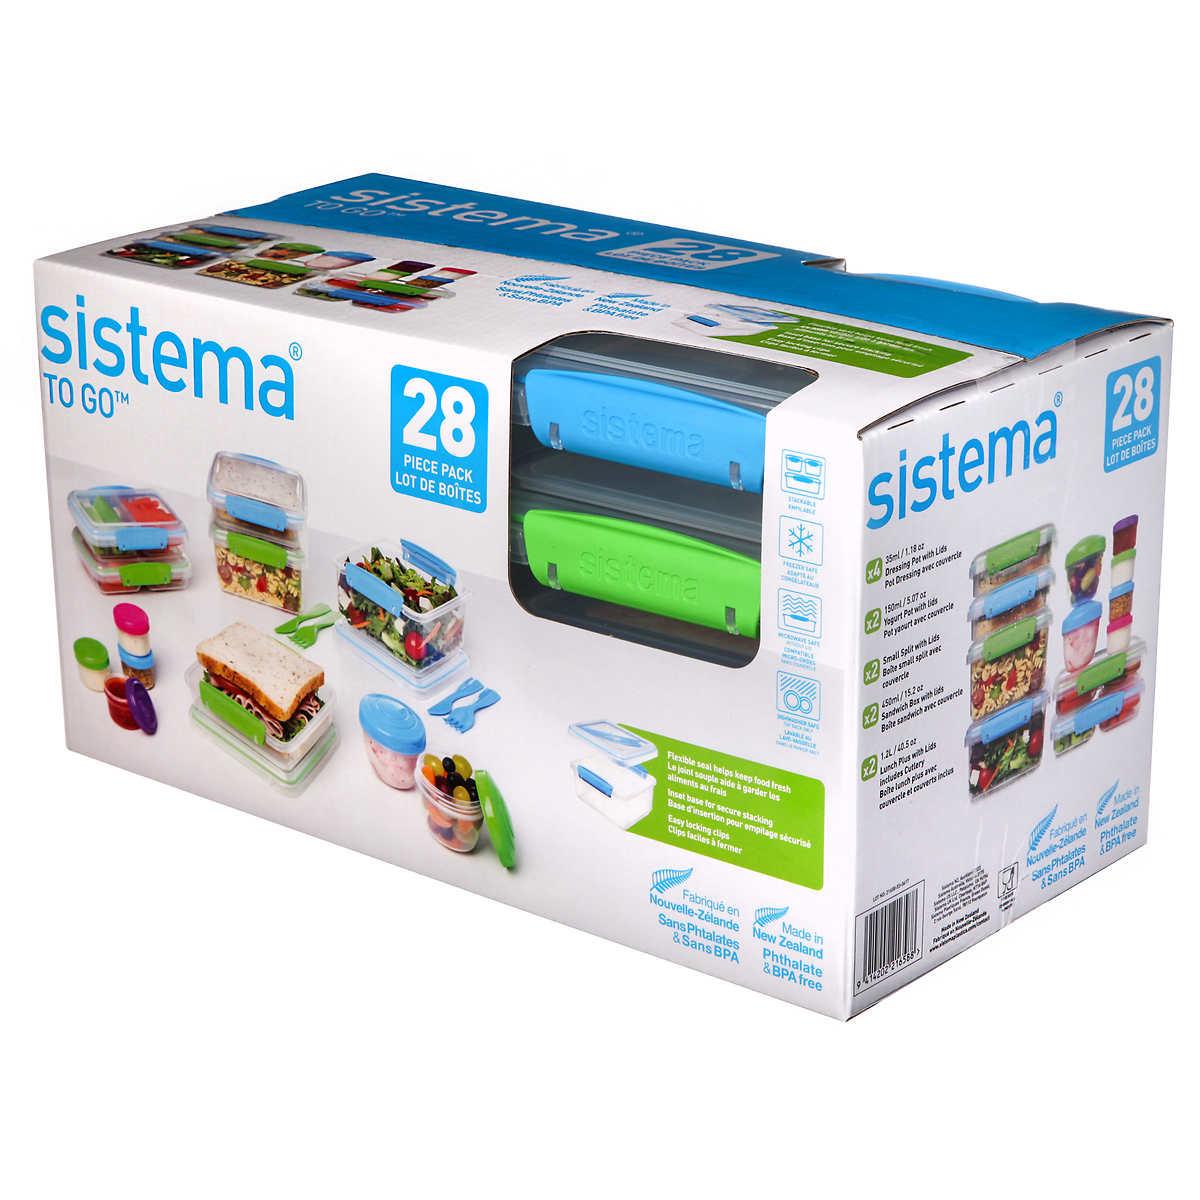 Sistema To Go 28-piece Food Storage Set